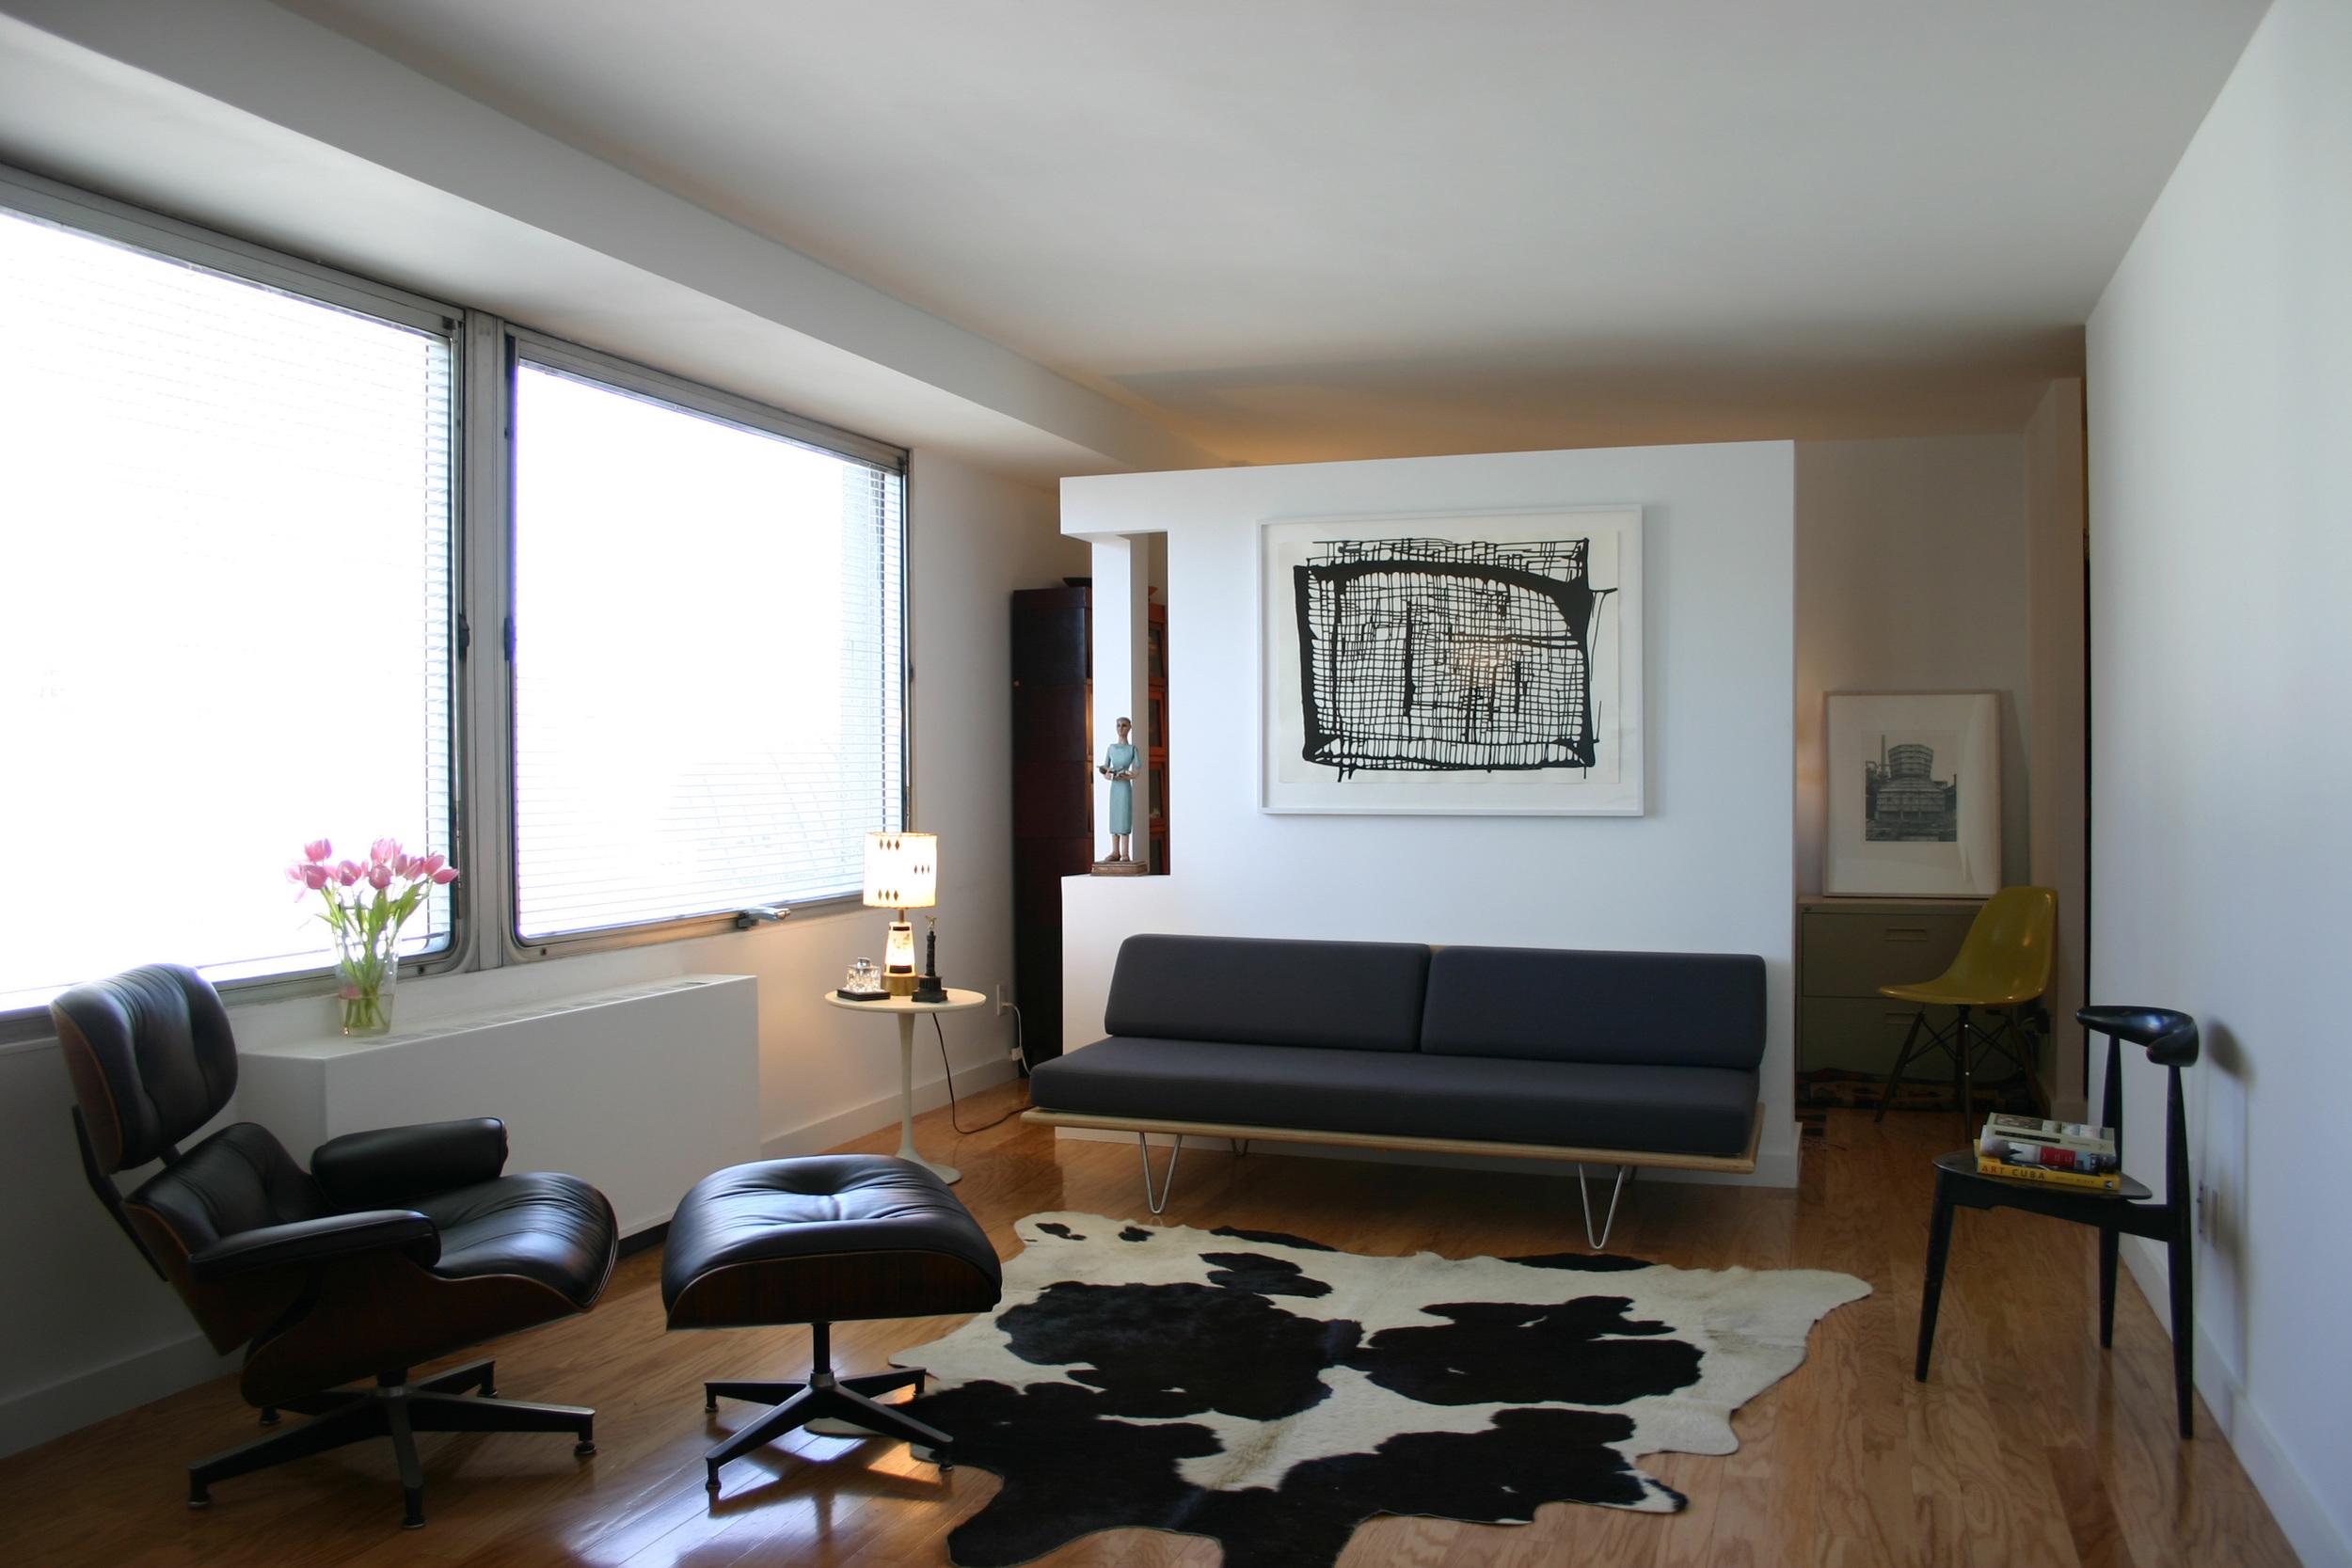 ART COLLECTOR'S STUDIO New York, NY